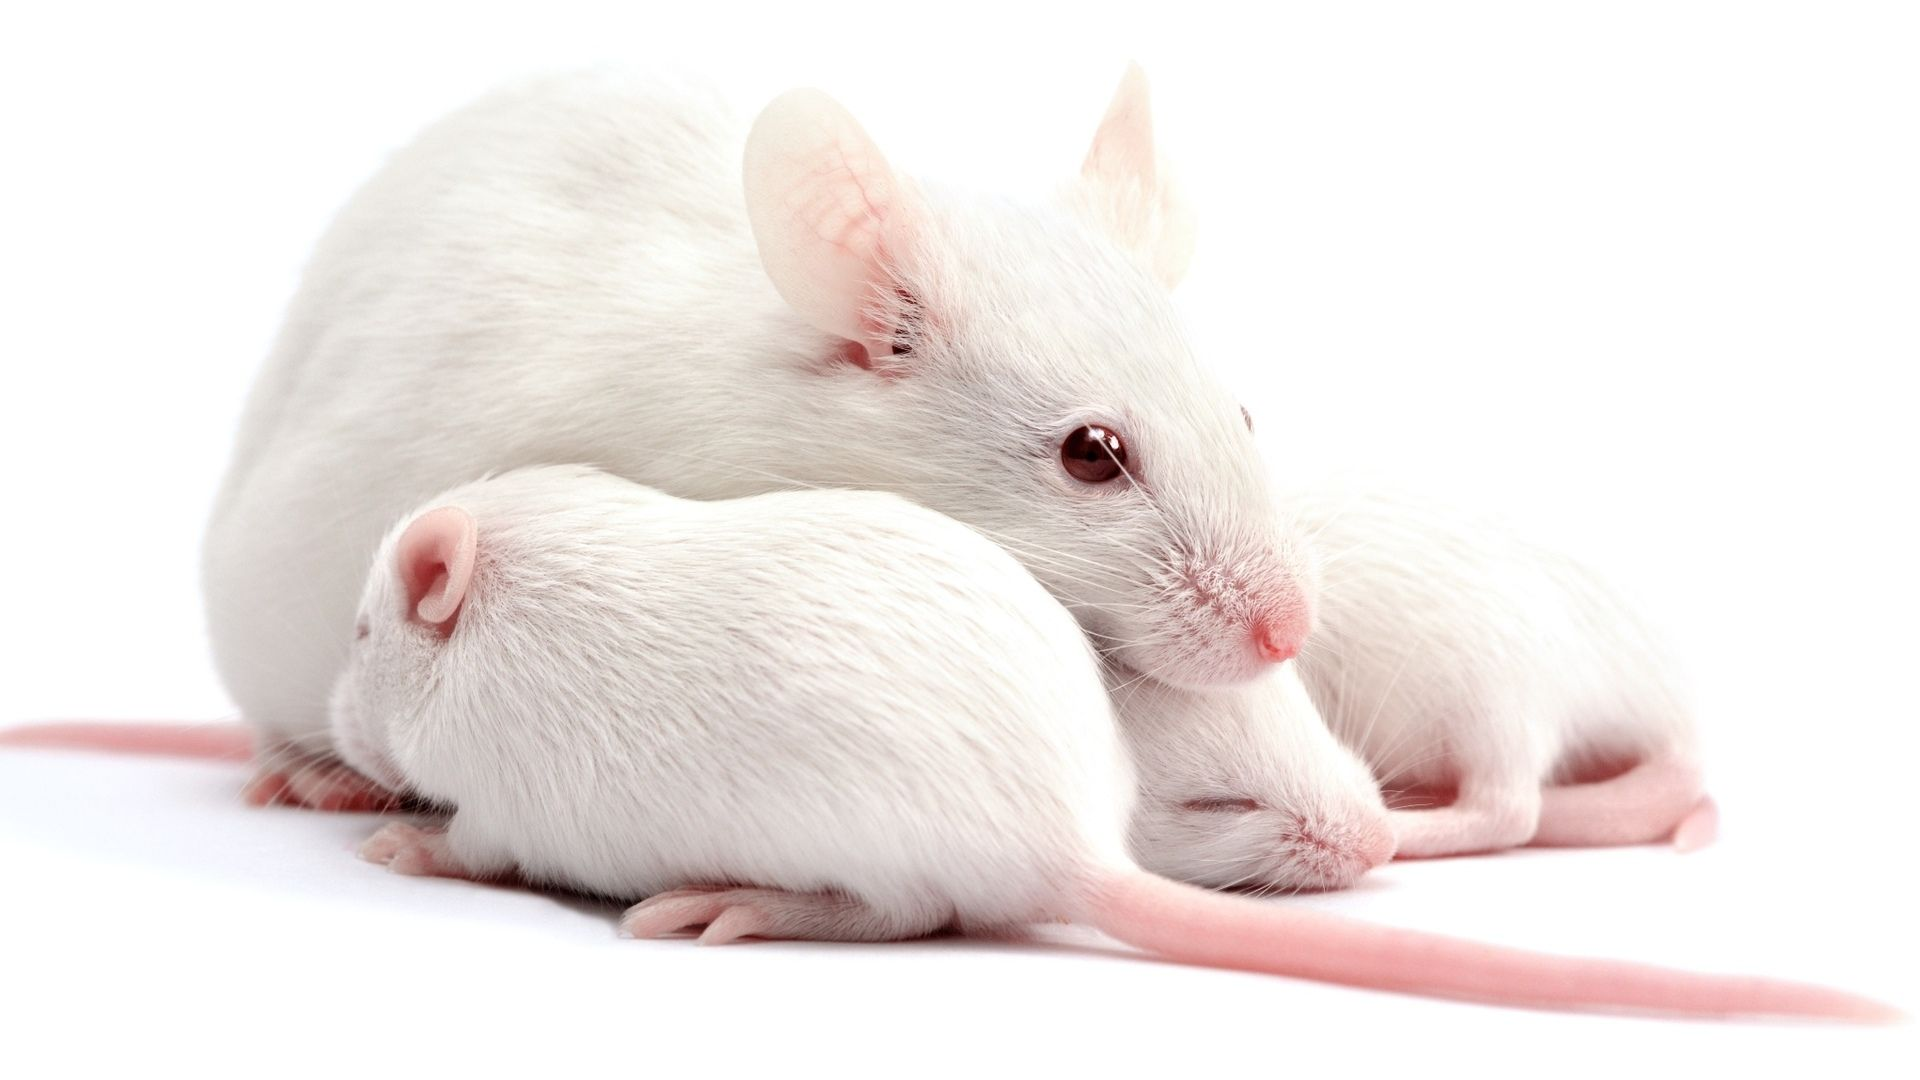 White Metal Rat Wallpaper Picture